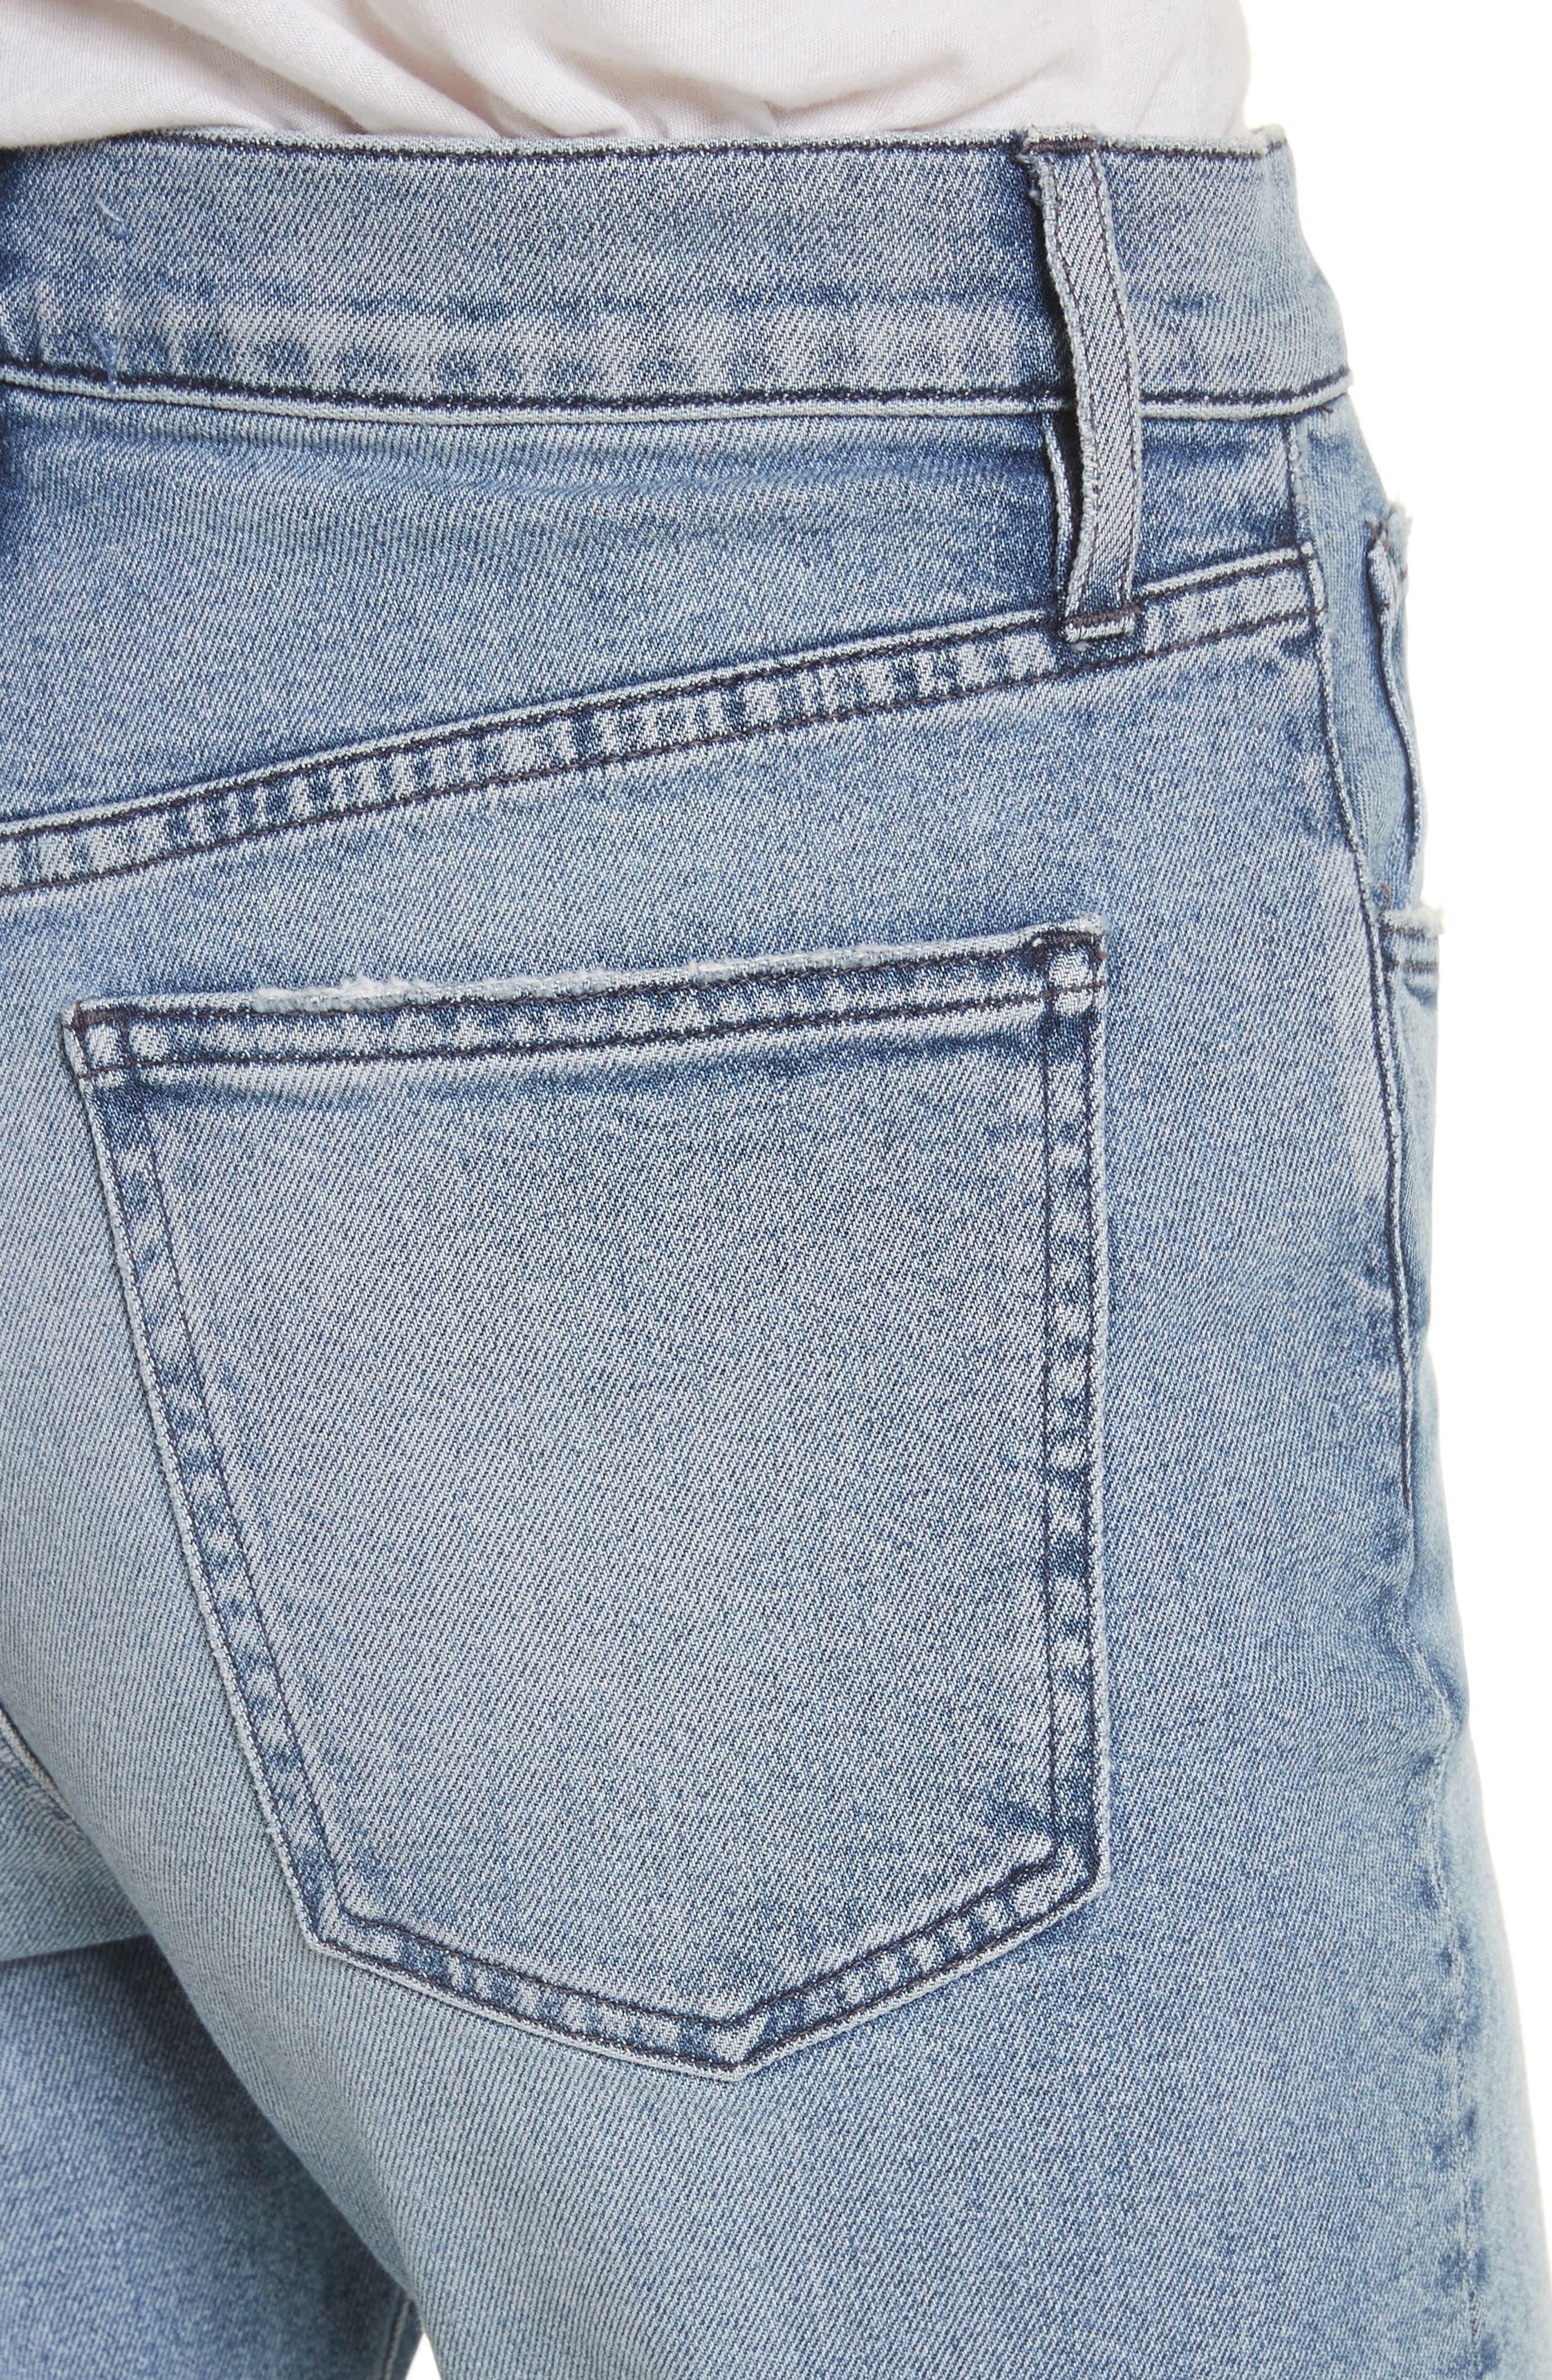 W3 Higher Ground Side Split Ankle Straight Leg Jeans,                             Alternate thumbnail 4, color,                             428